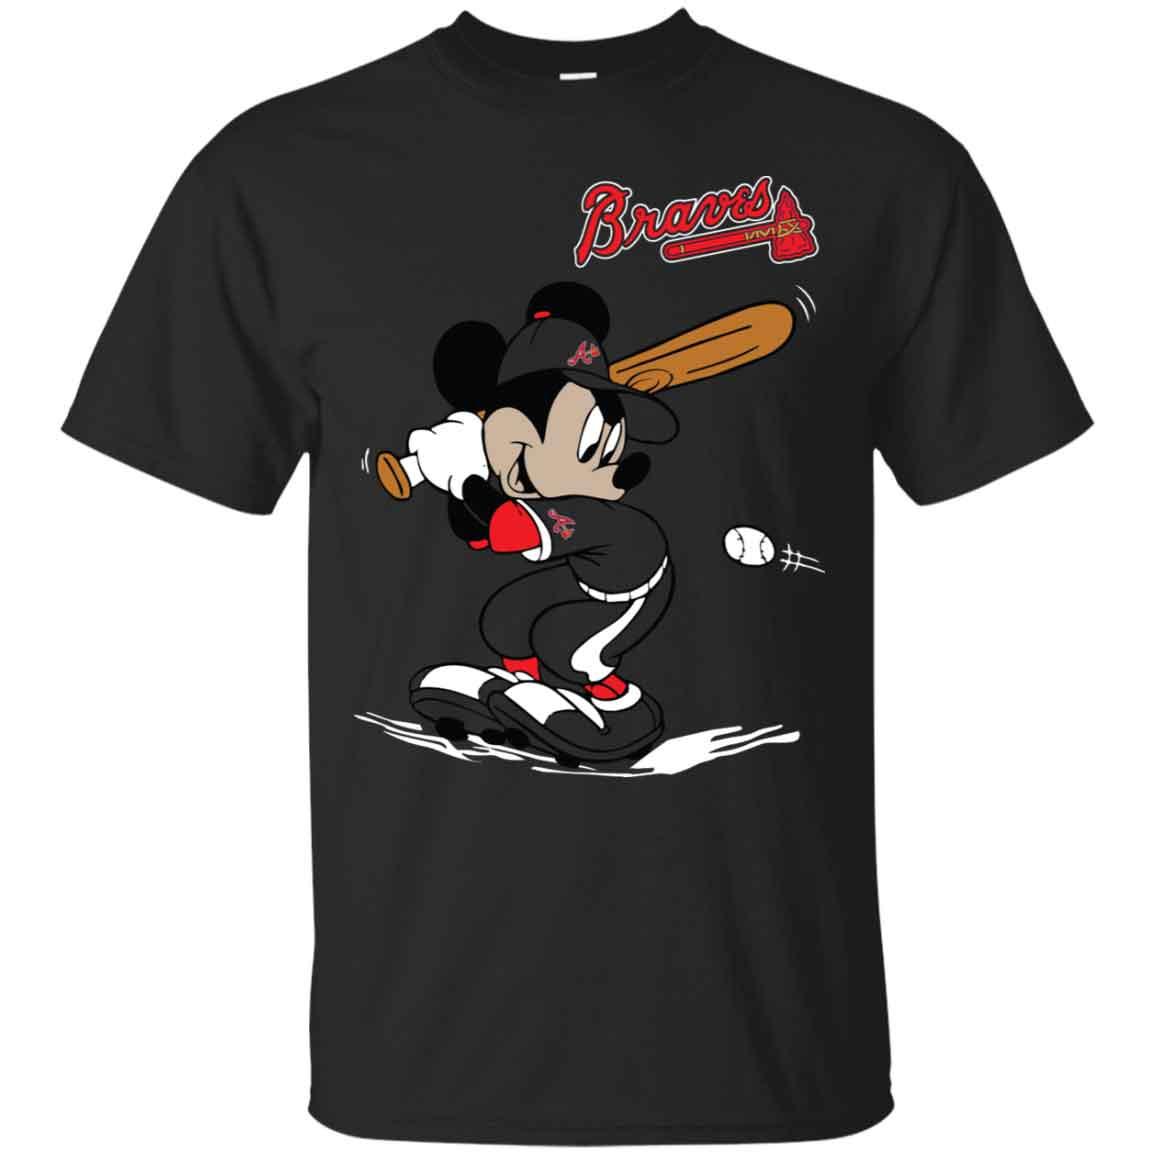 quality design c01cd 82d62 Mickey Mouse Baseball Atlanta Braves Hoodies Sweatshirts